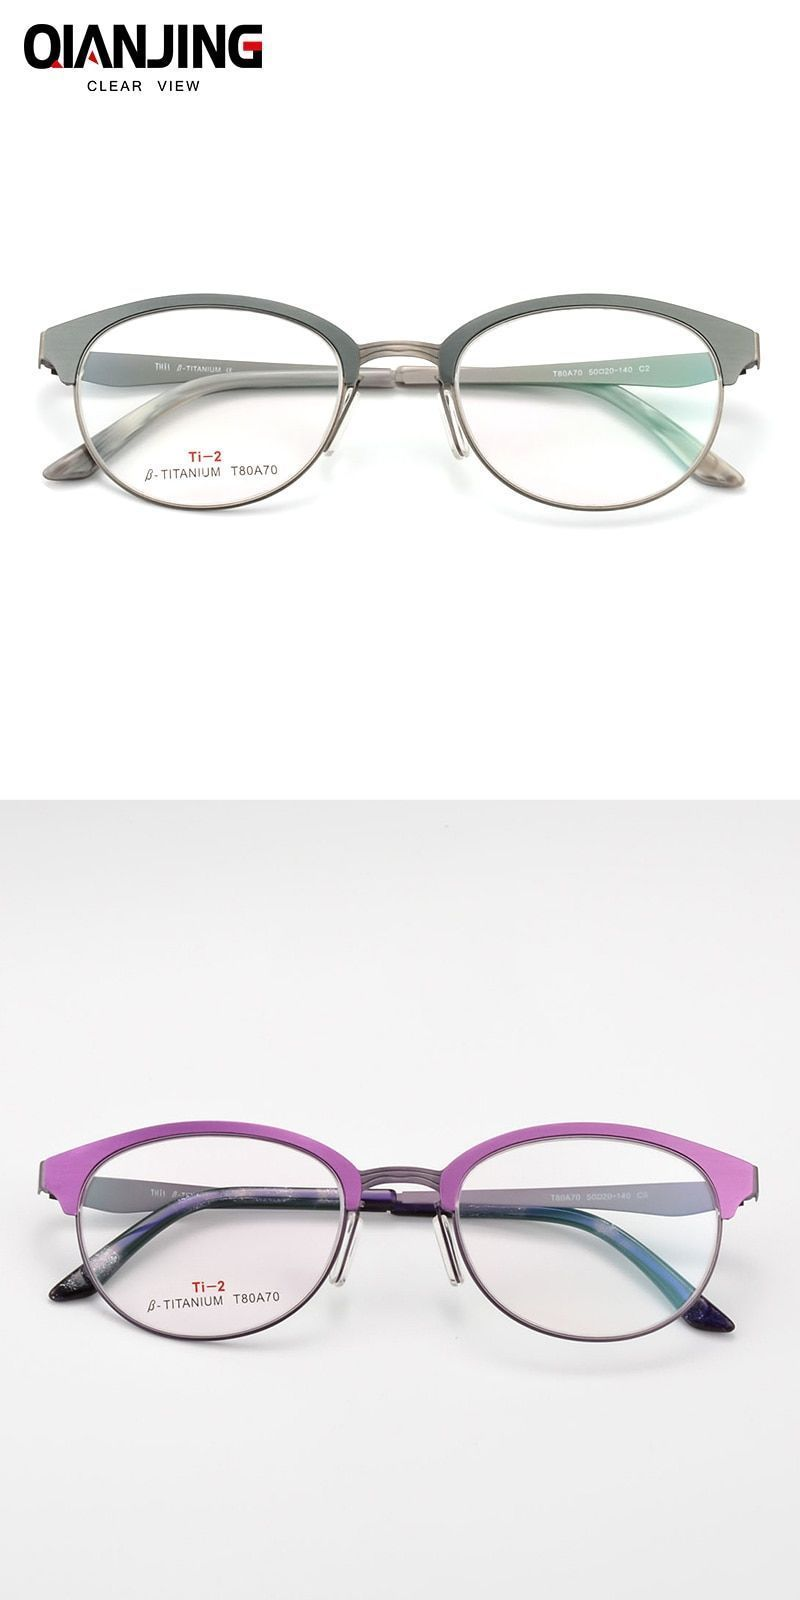 3e61ce0ef36 Qj titanium glasses frame women brand designer female vintage round  prescription eyeglasses full myopia optical frames eyewear  frames  eyewear   accessories ...